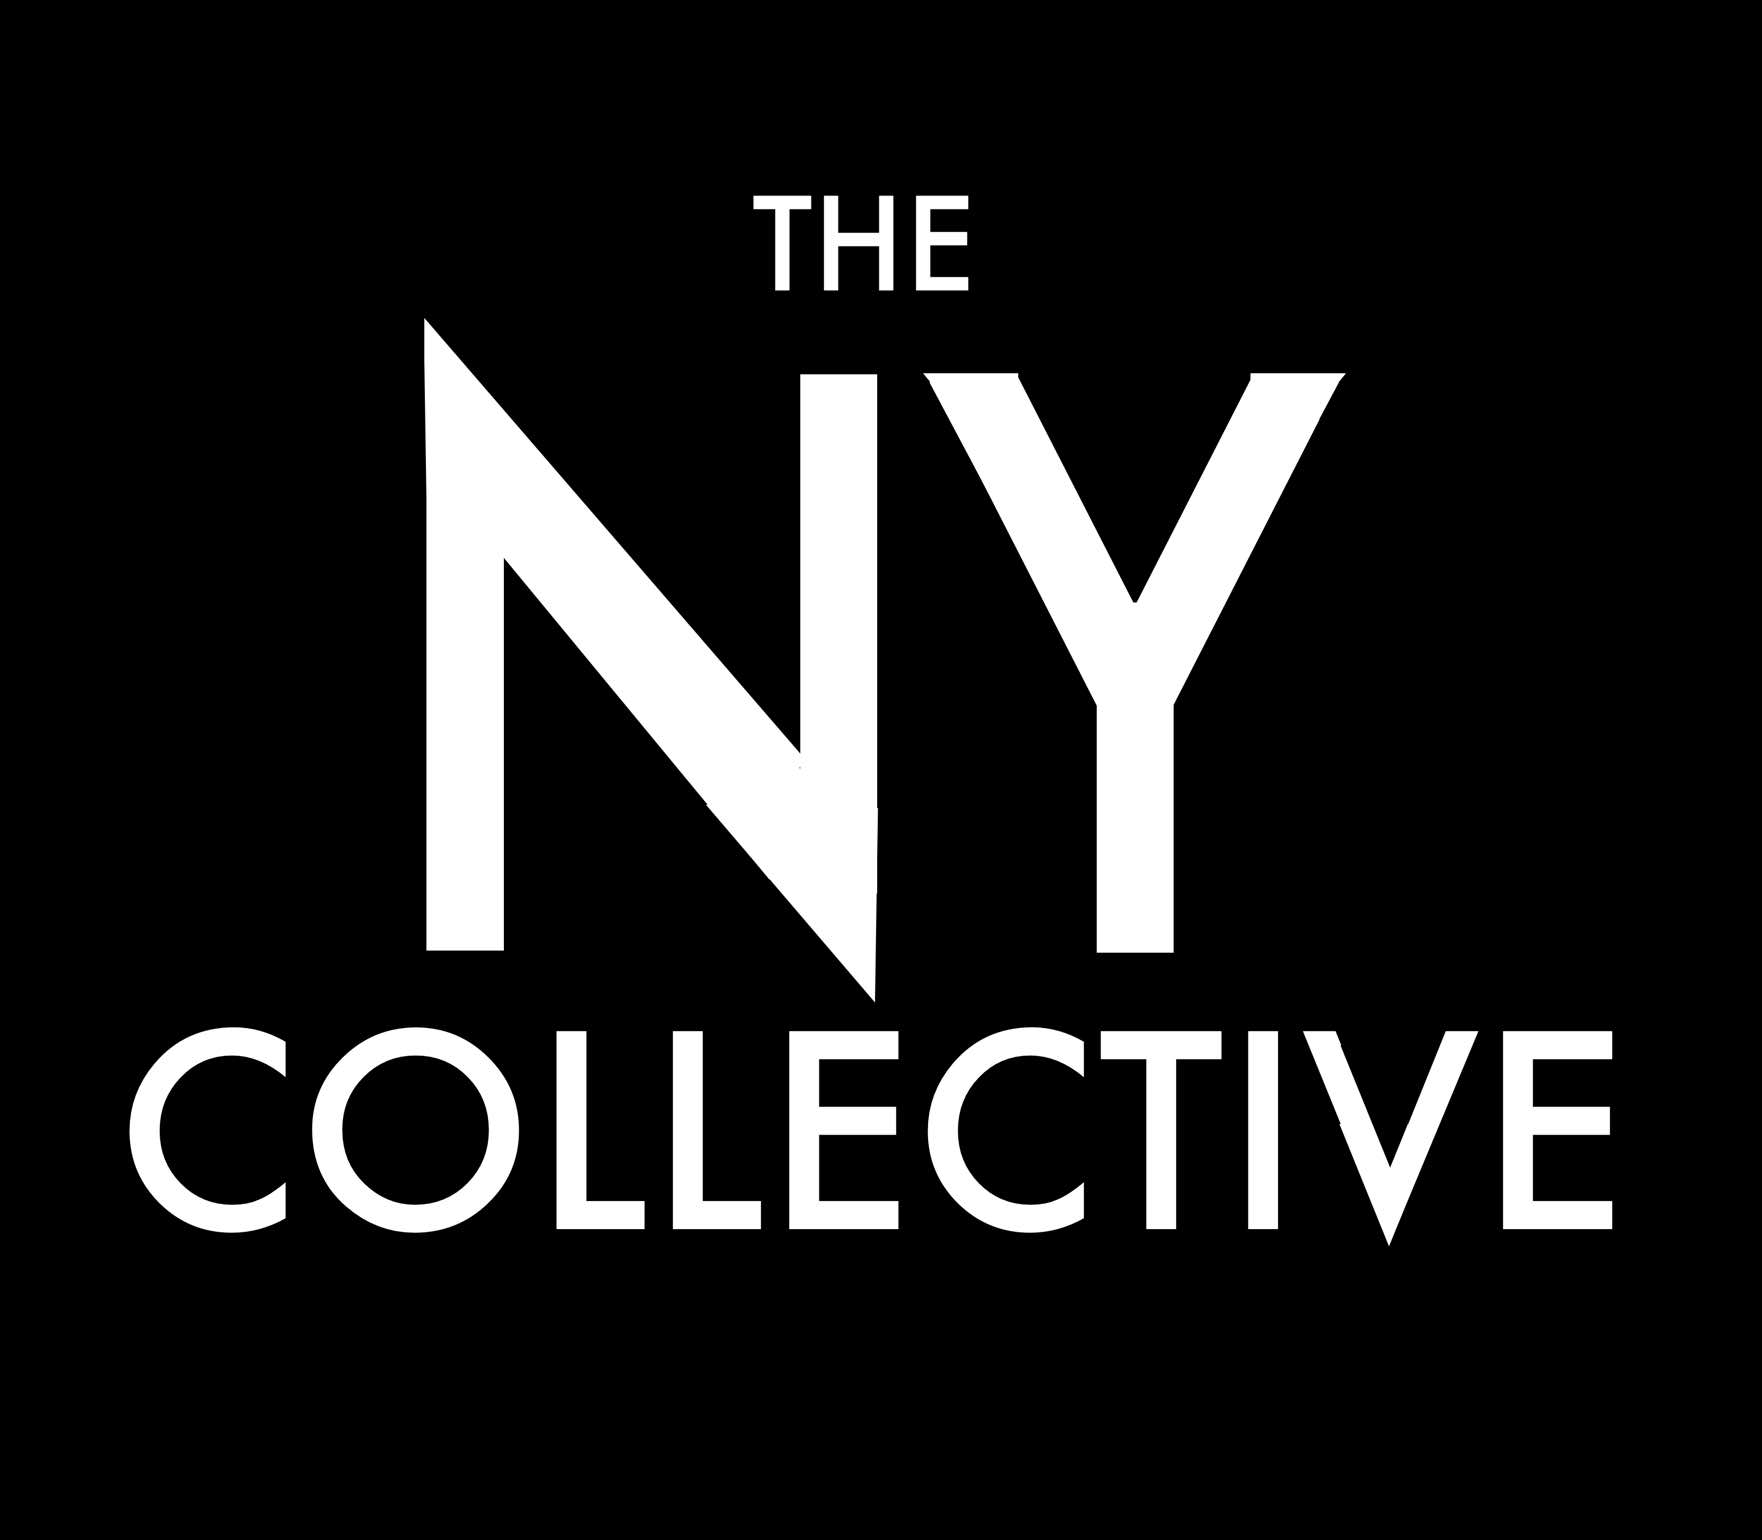 B:W NYC SHORT SLUG copy.jpg